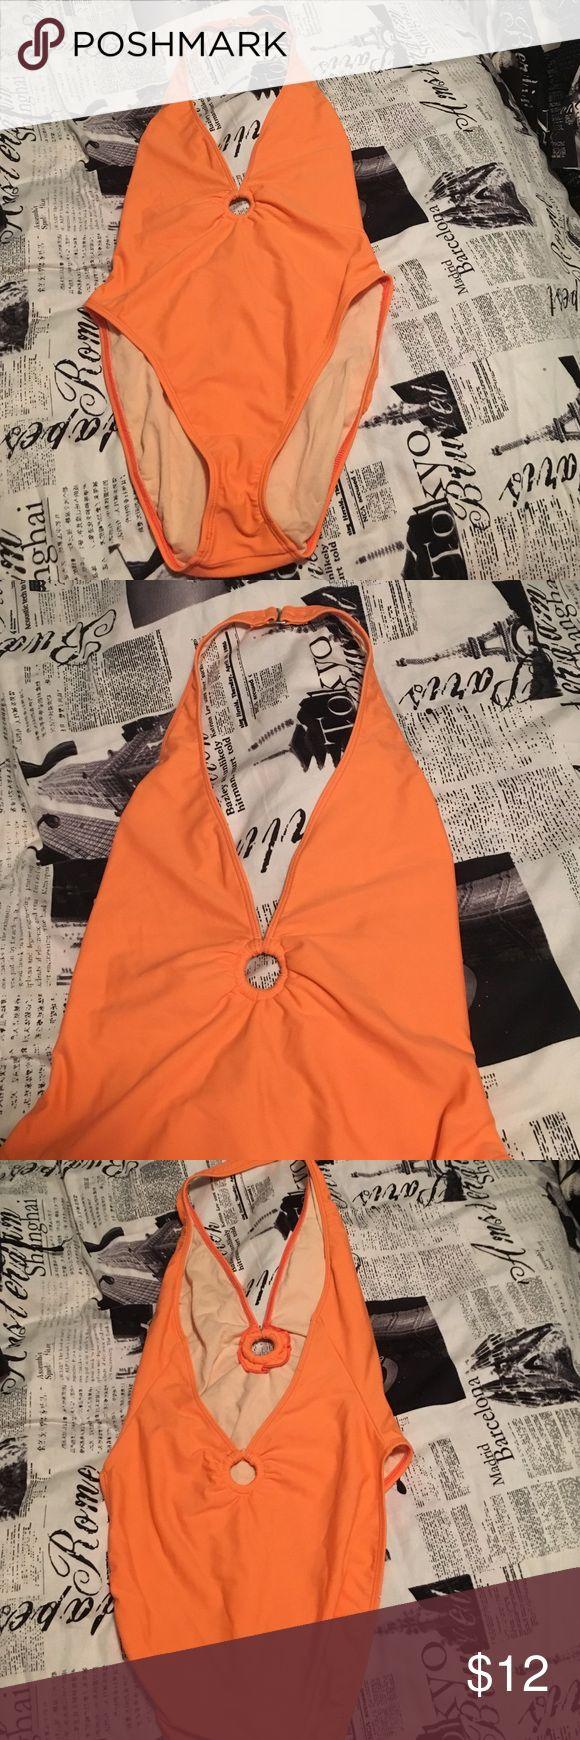 Orange one piece women's swimsuit Orange one piece women's swimsuit La Blanca Swim One Pieces